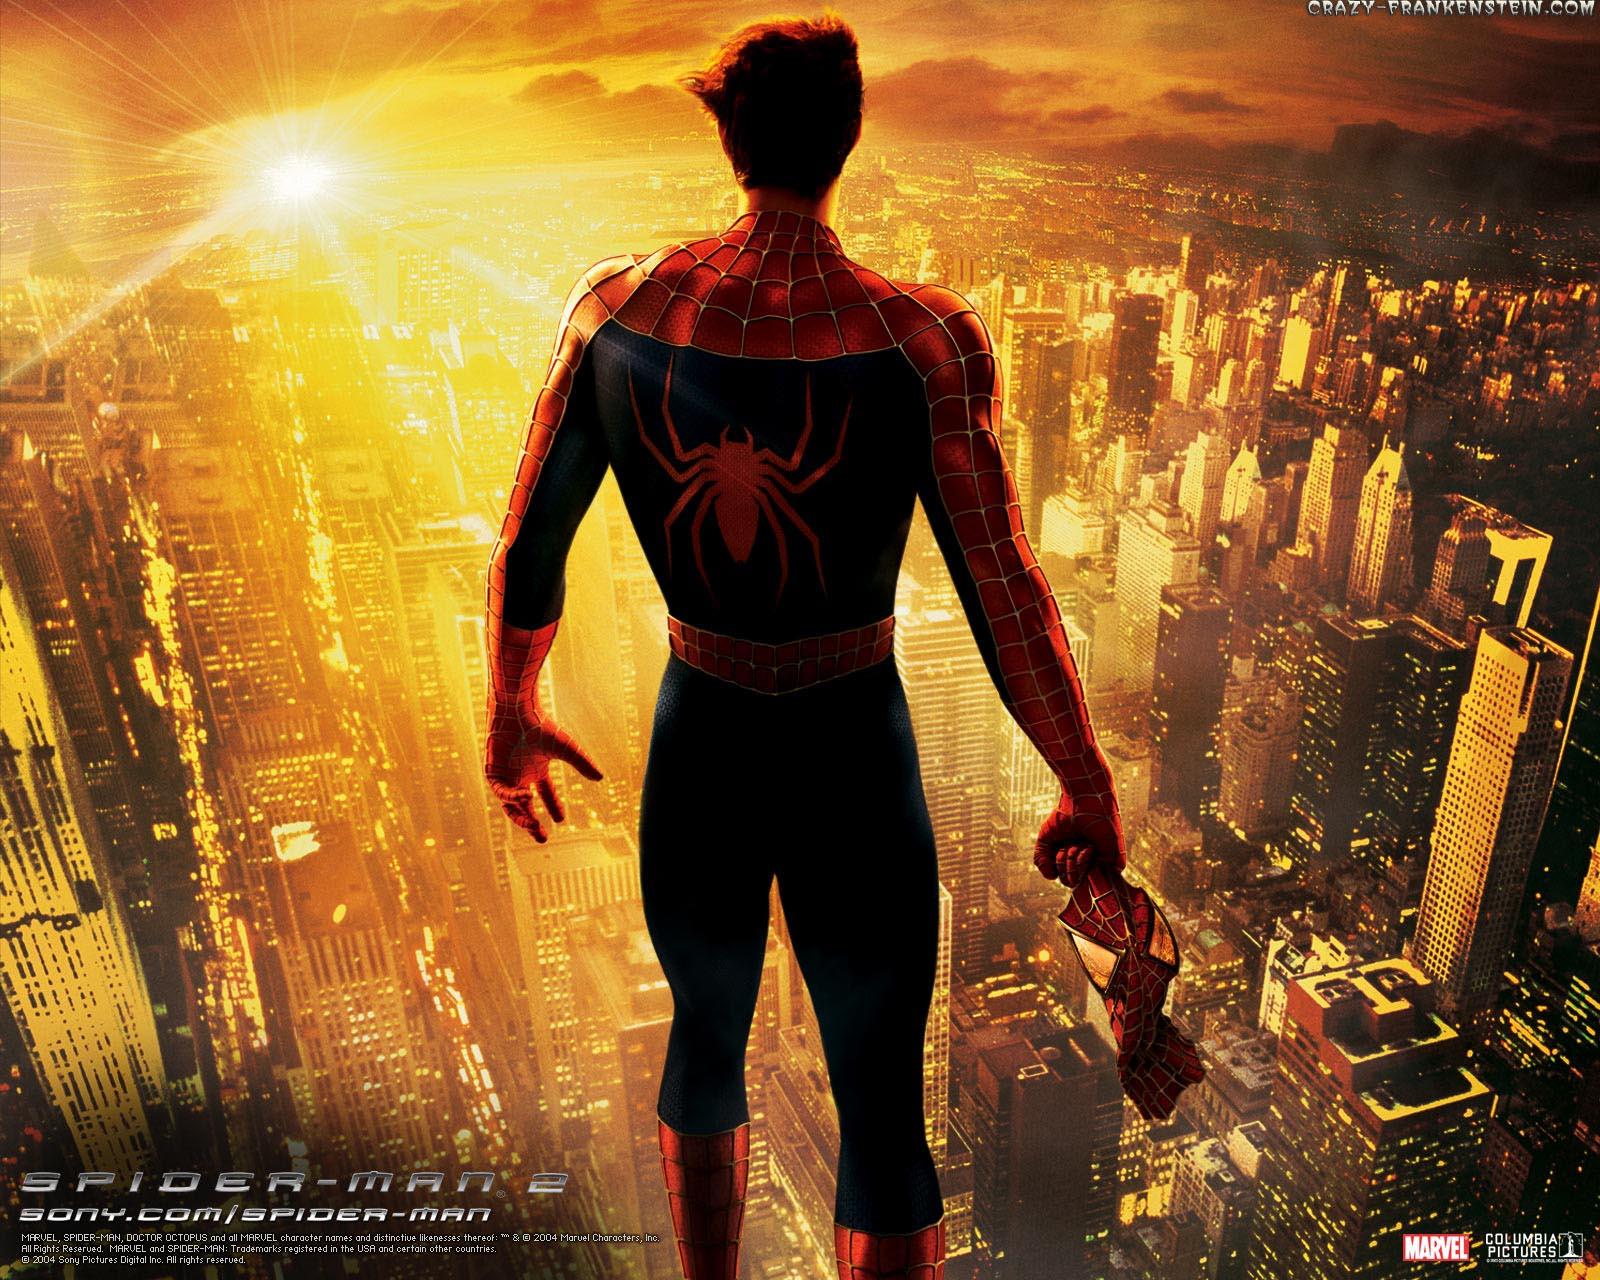 http://4.bp.blogspot.com/-SFZK0dY1NzU/T88YRD7-ESI/AAAAAAAAApk/jLXkJ3uO8ZM/s1600/spiderman-.jpg